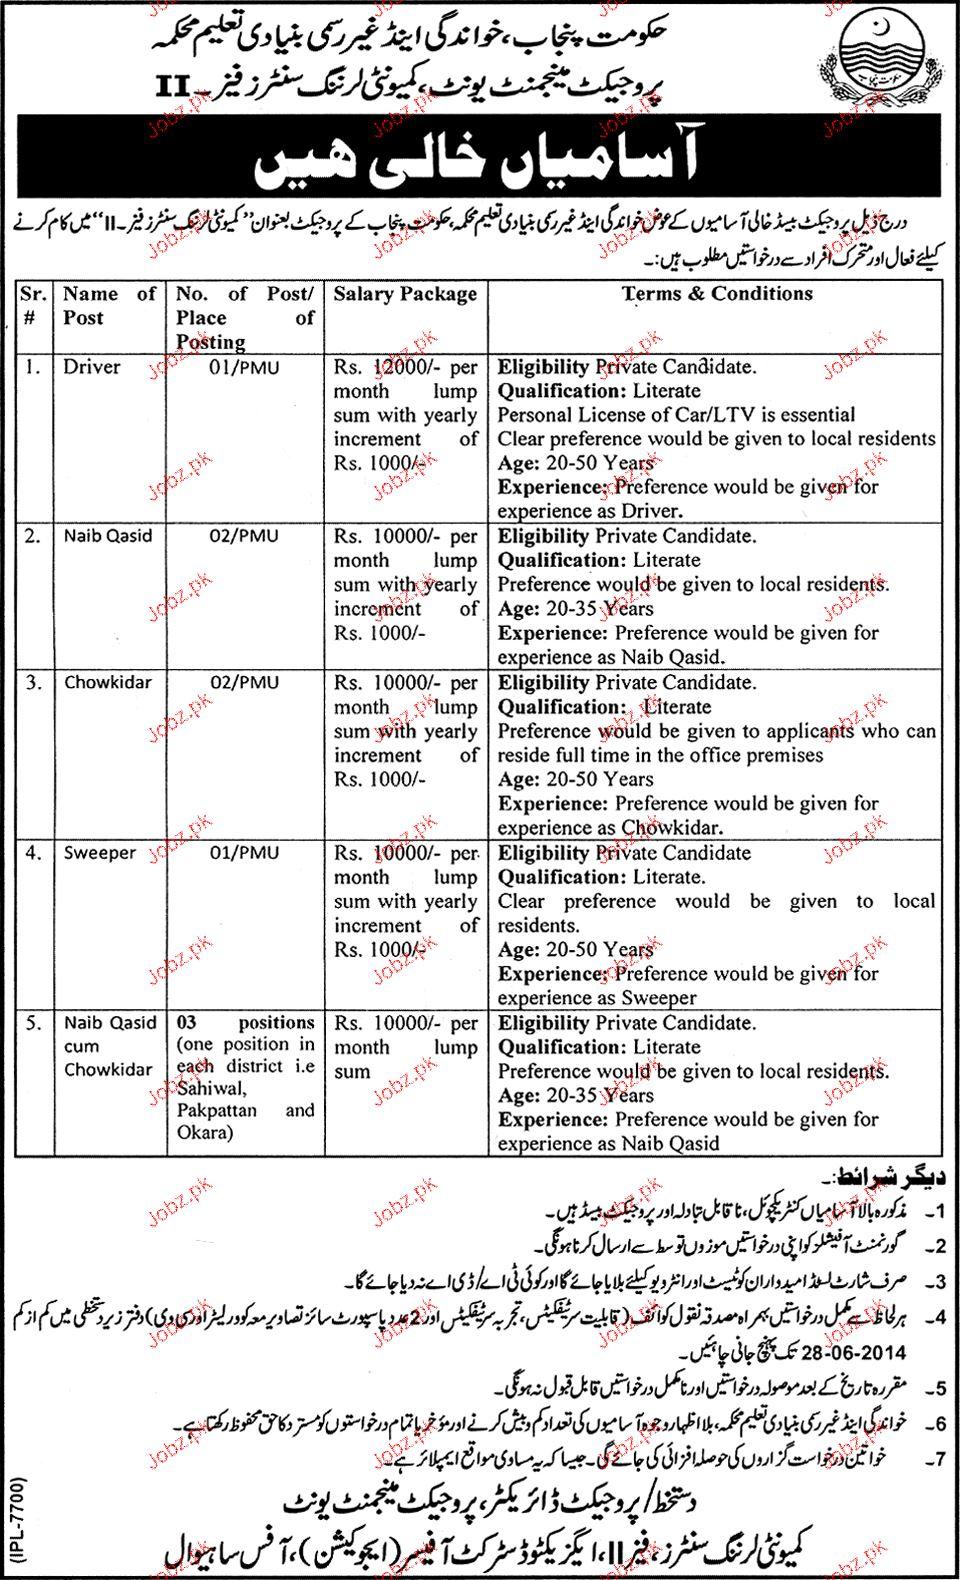 Drivers, Naib Qasid and Chawkidars Job Opportunity